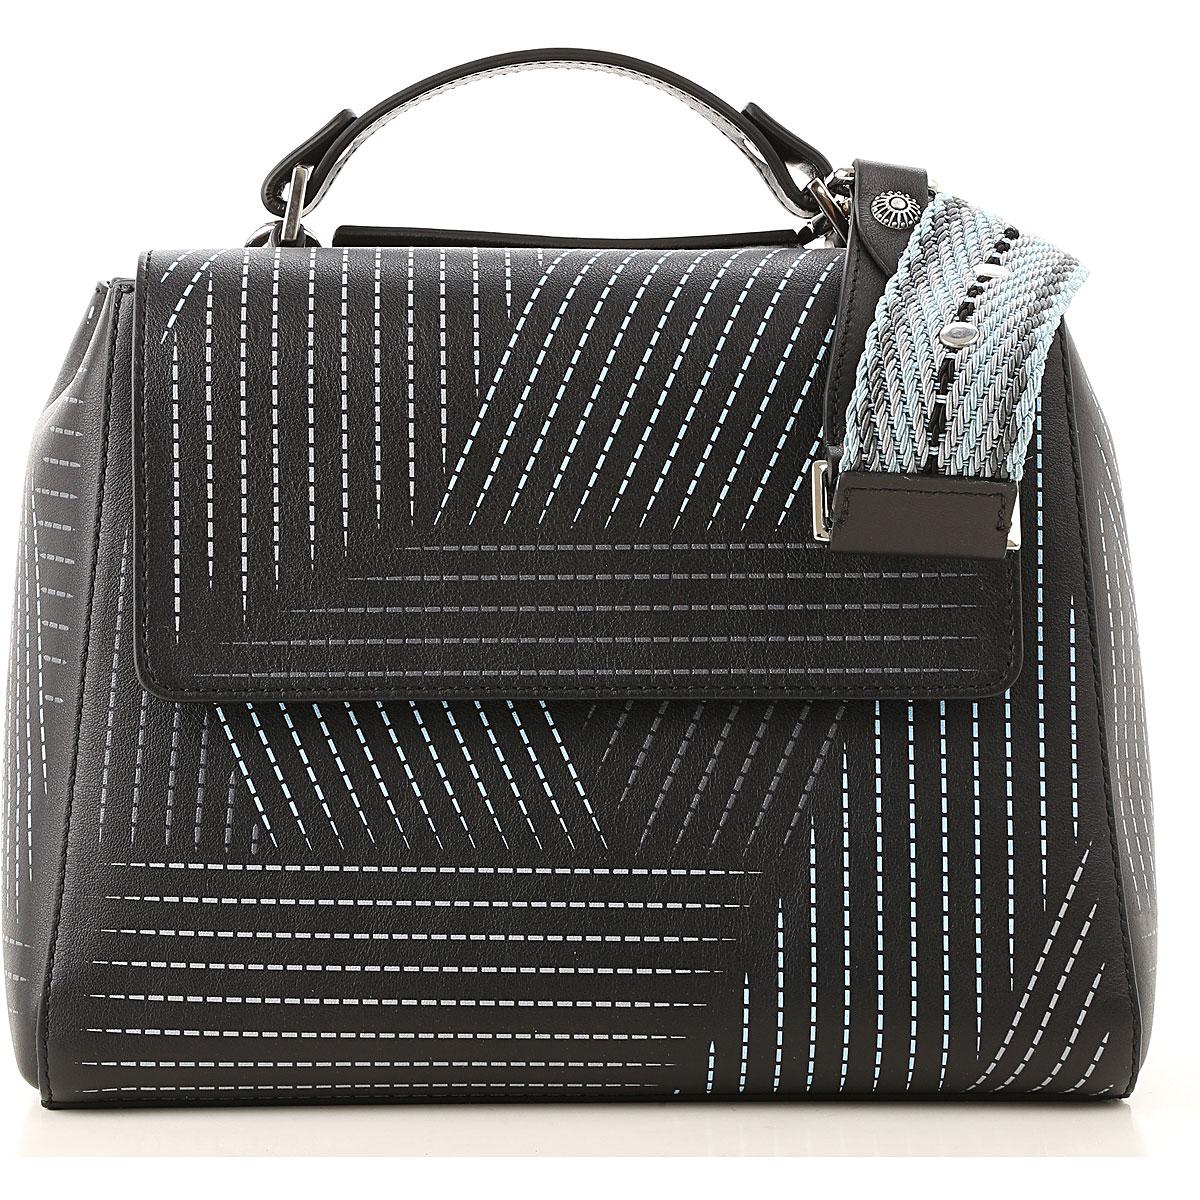 Orciani Top Handle Handbag On Sale, Black, Leather, 2019